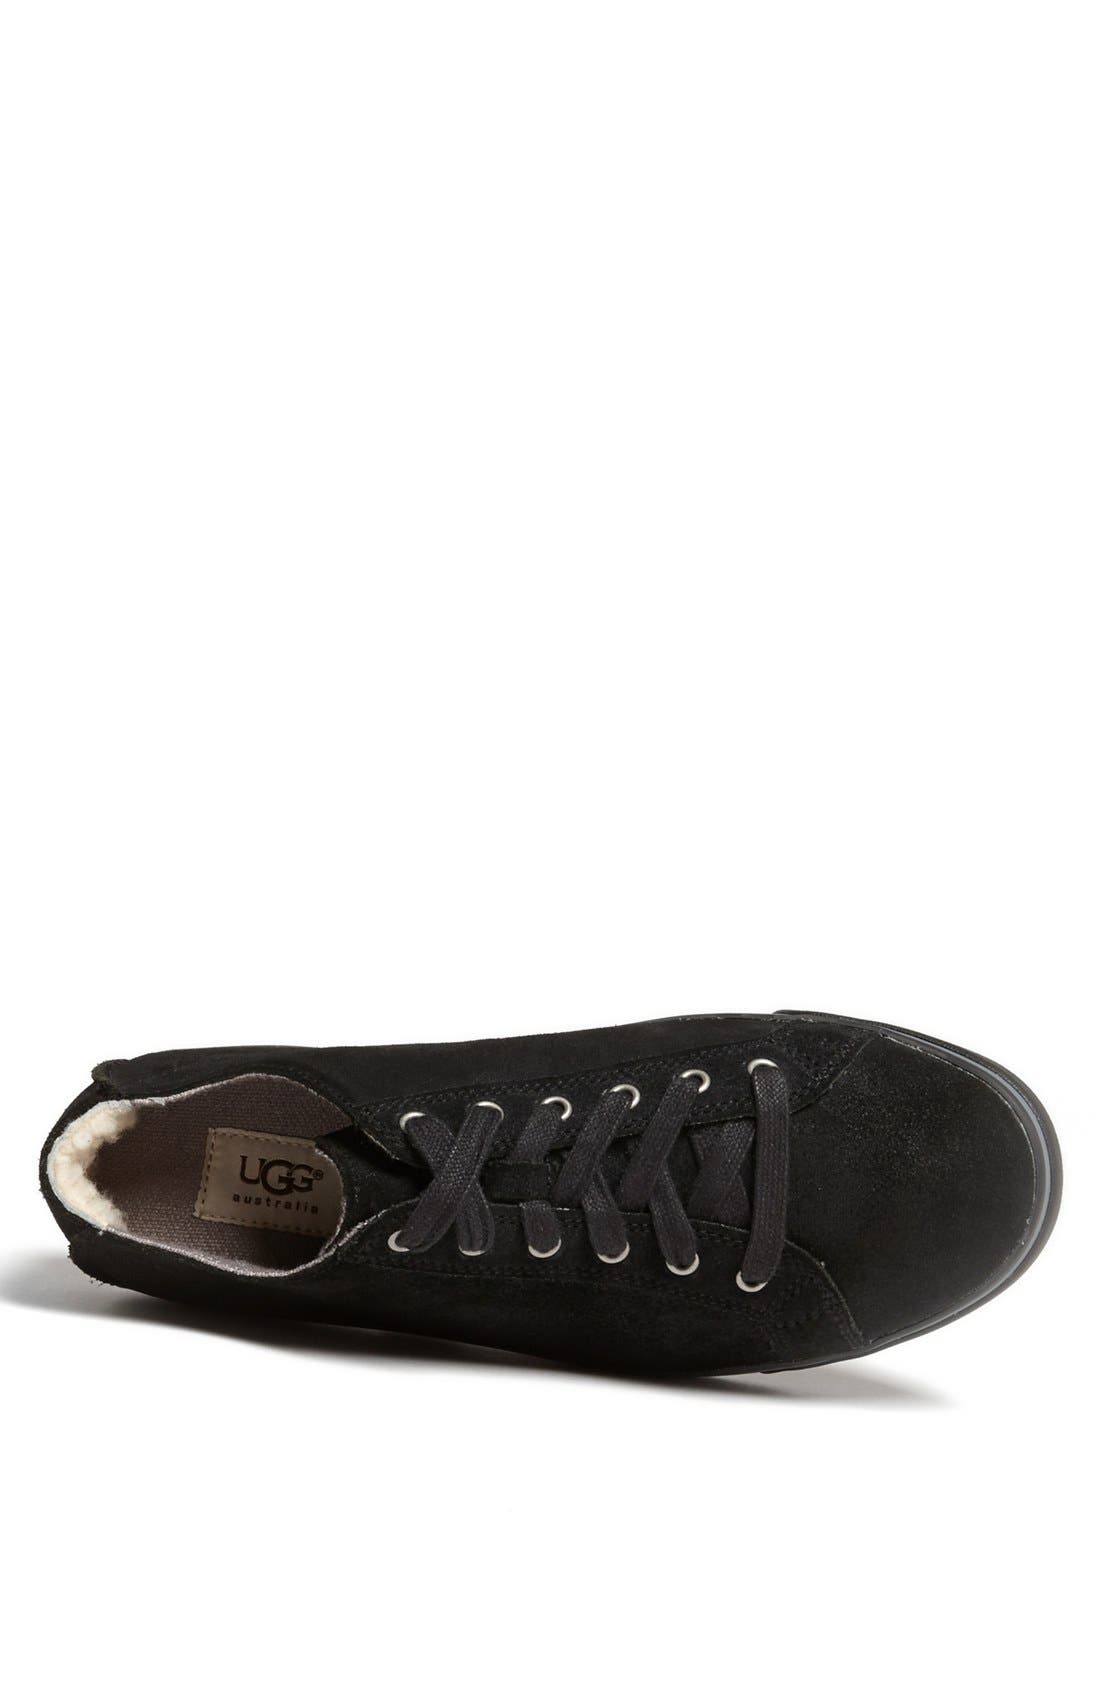 Australia 'Vanowen' Sneaker,                             Alternate thumbnail 4, color,                             001